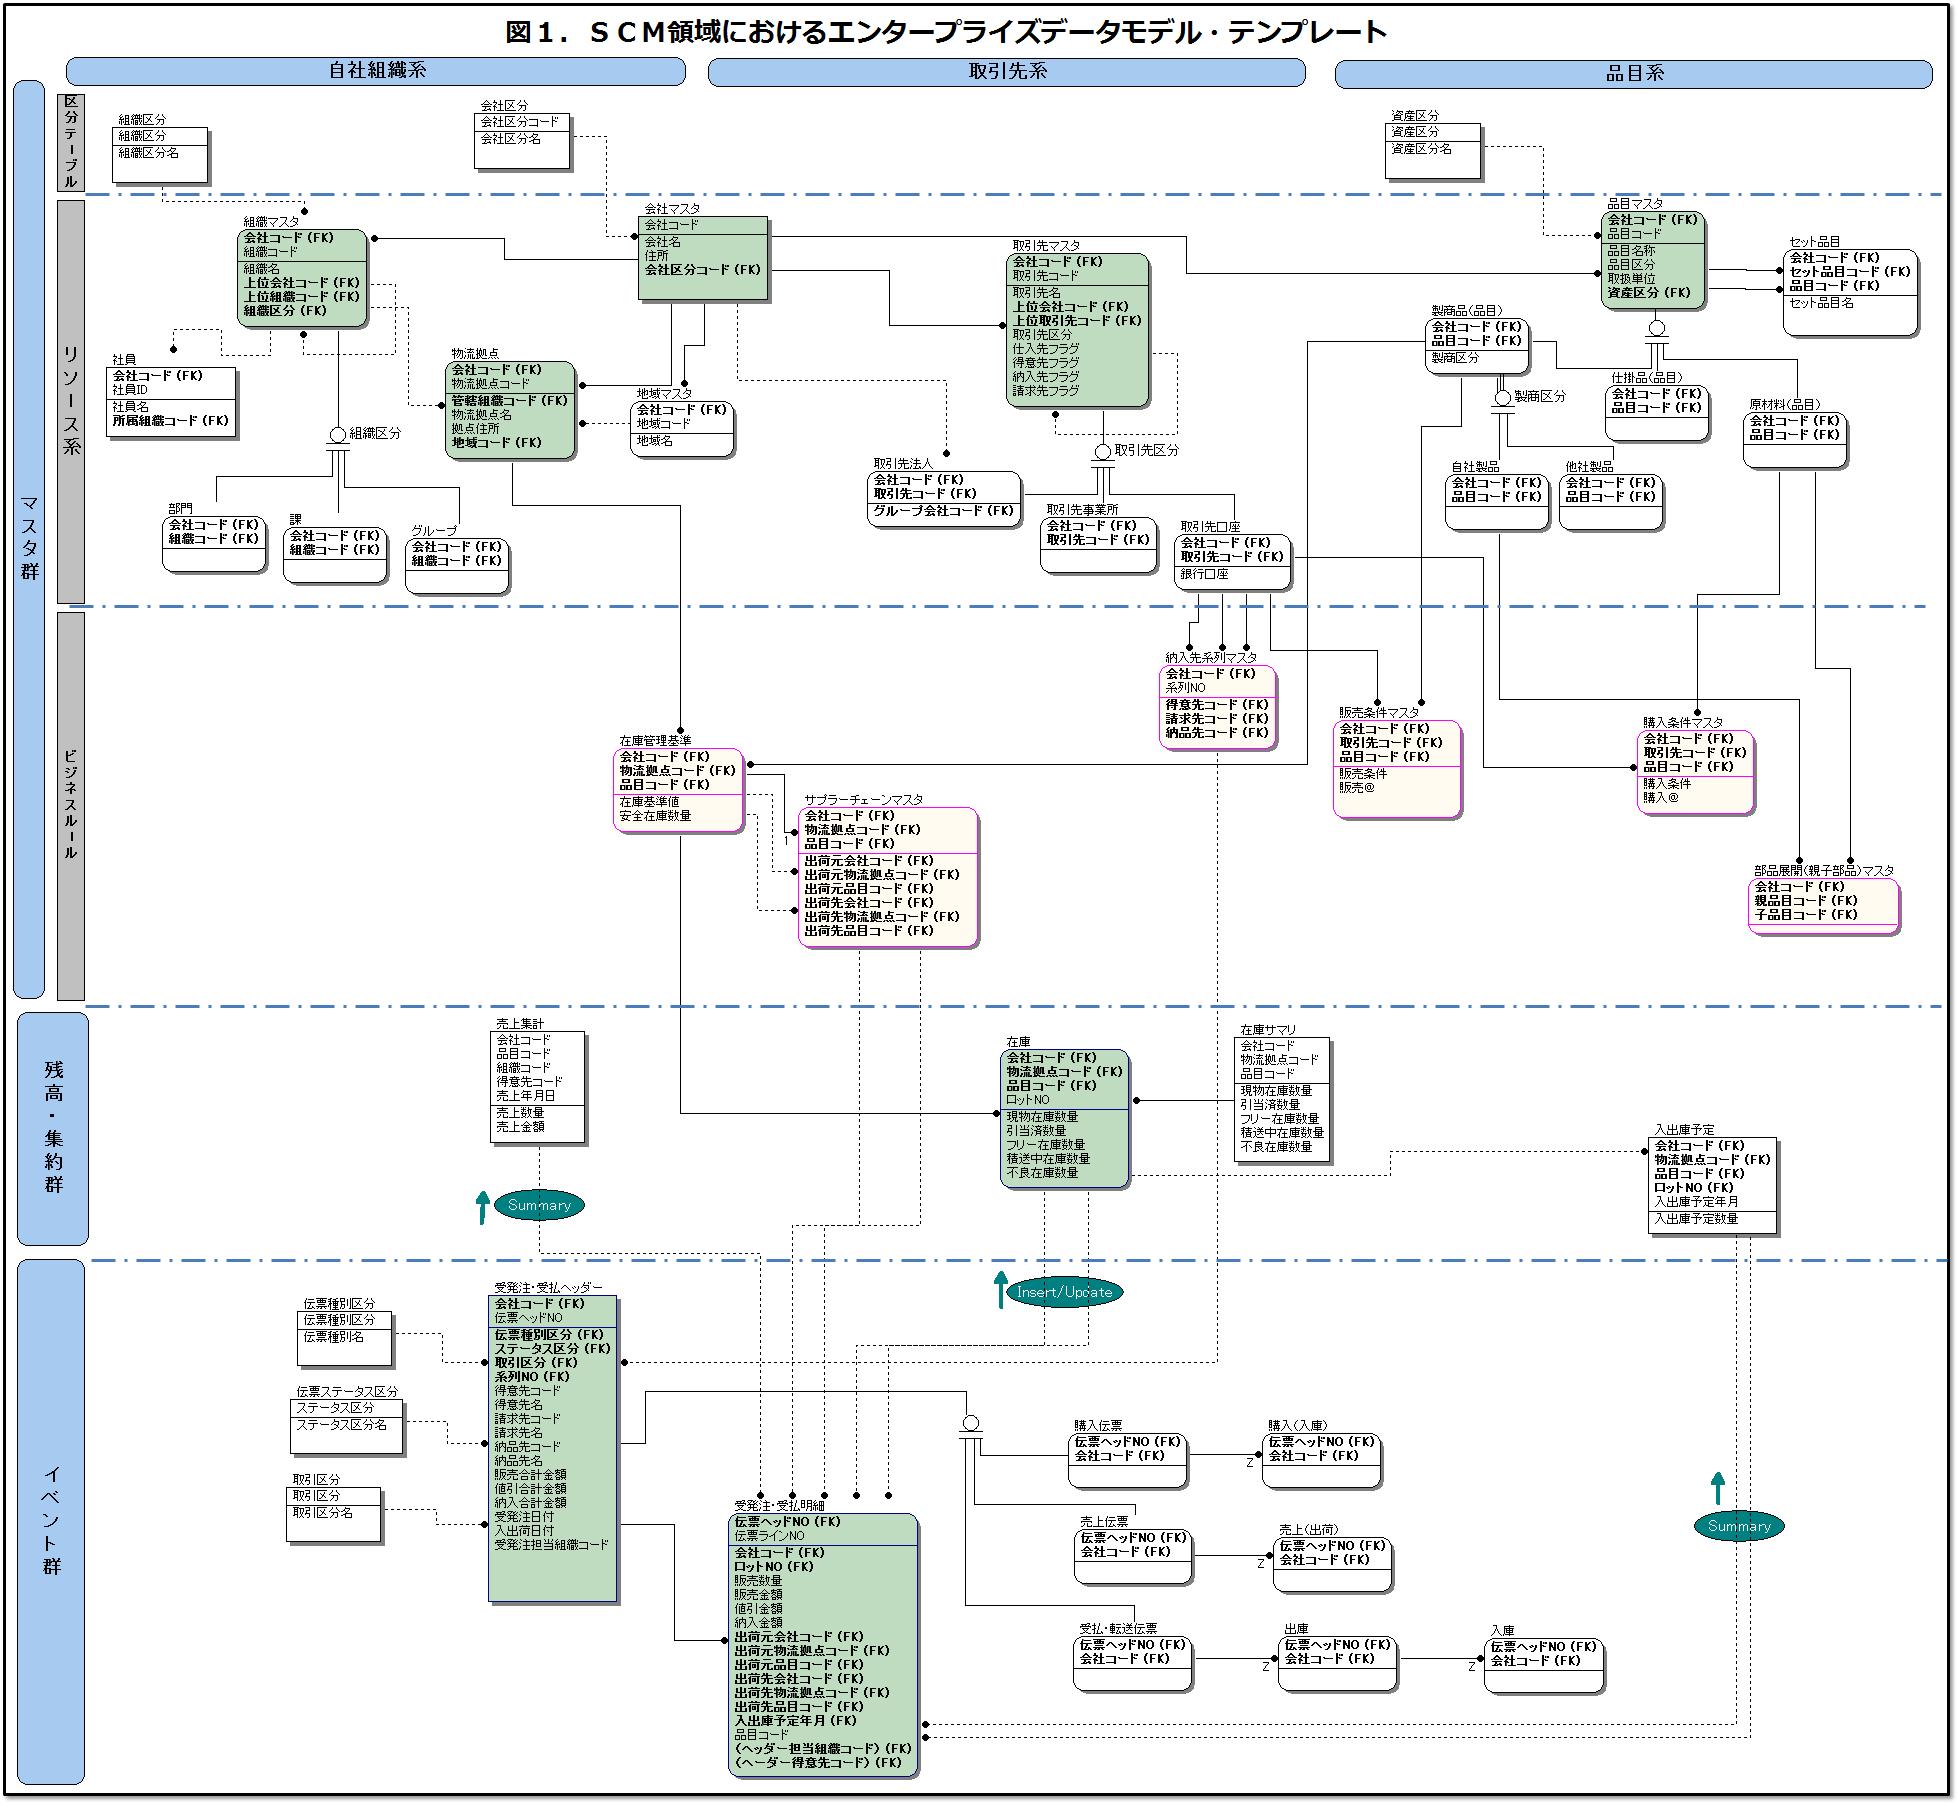 SCMデータモデル・テンプレート